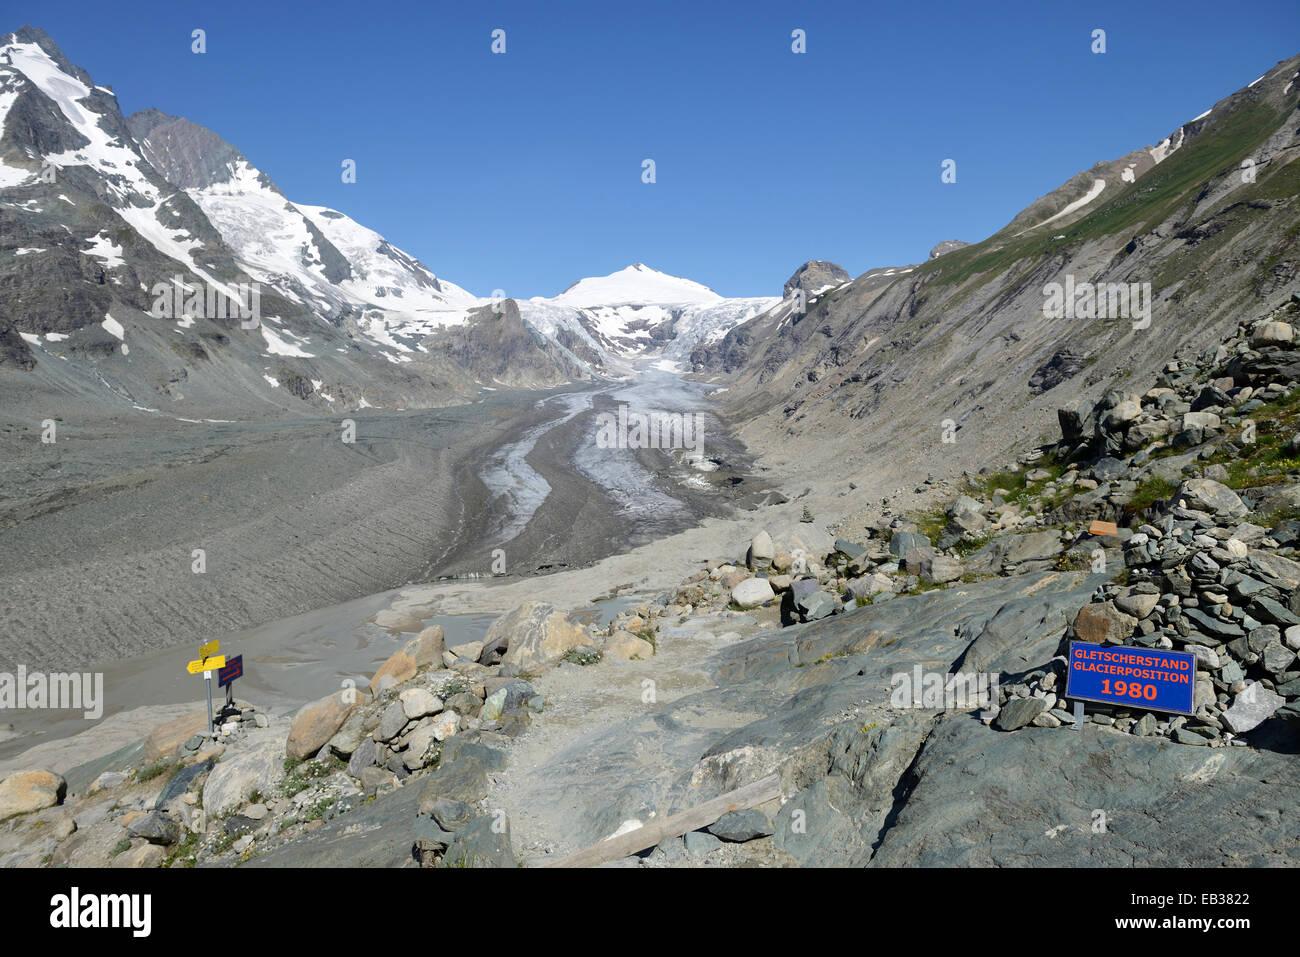 Panel about the glacier dimensions of 1980, Pasterze Glacier, Mt Johannisberg at back, Kaiser-Franz-Josefs-Höhe, - Stock Image